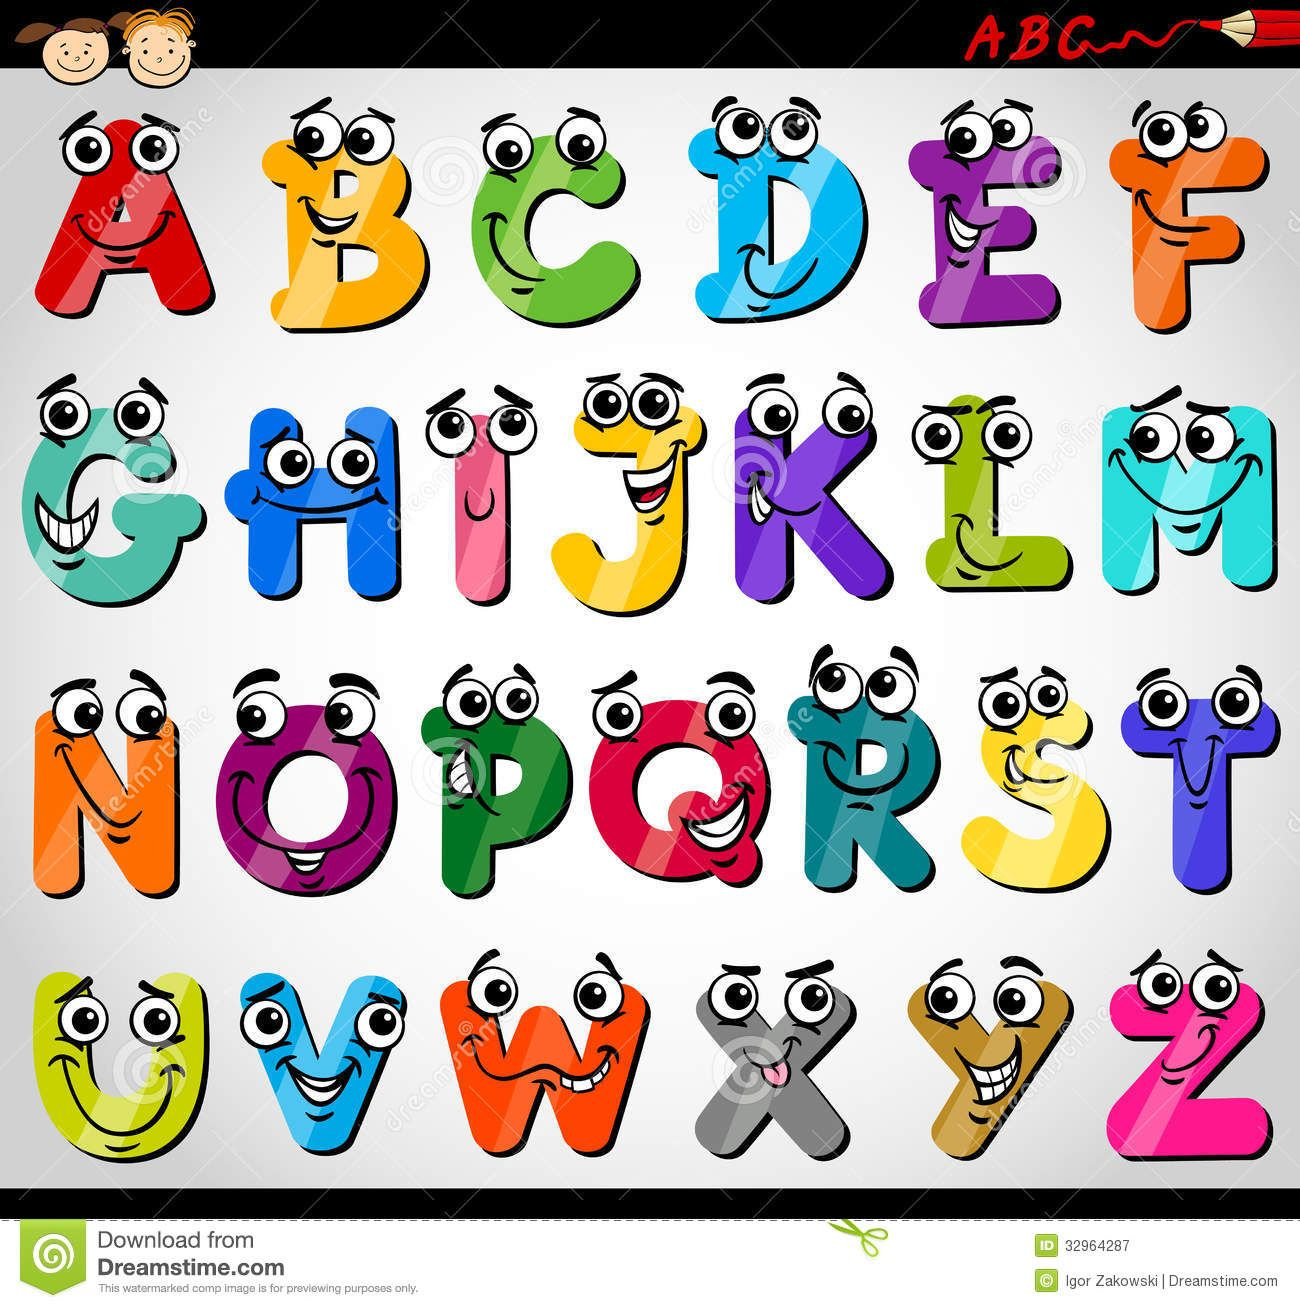 8 Letter Cartoon Characters : Pin by carina alves on desenhos pinterest alphabet